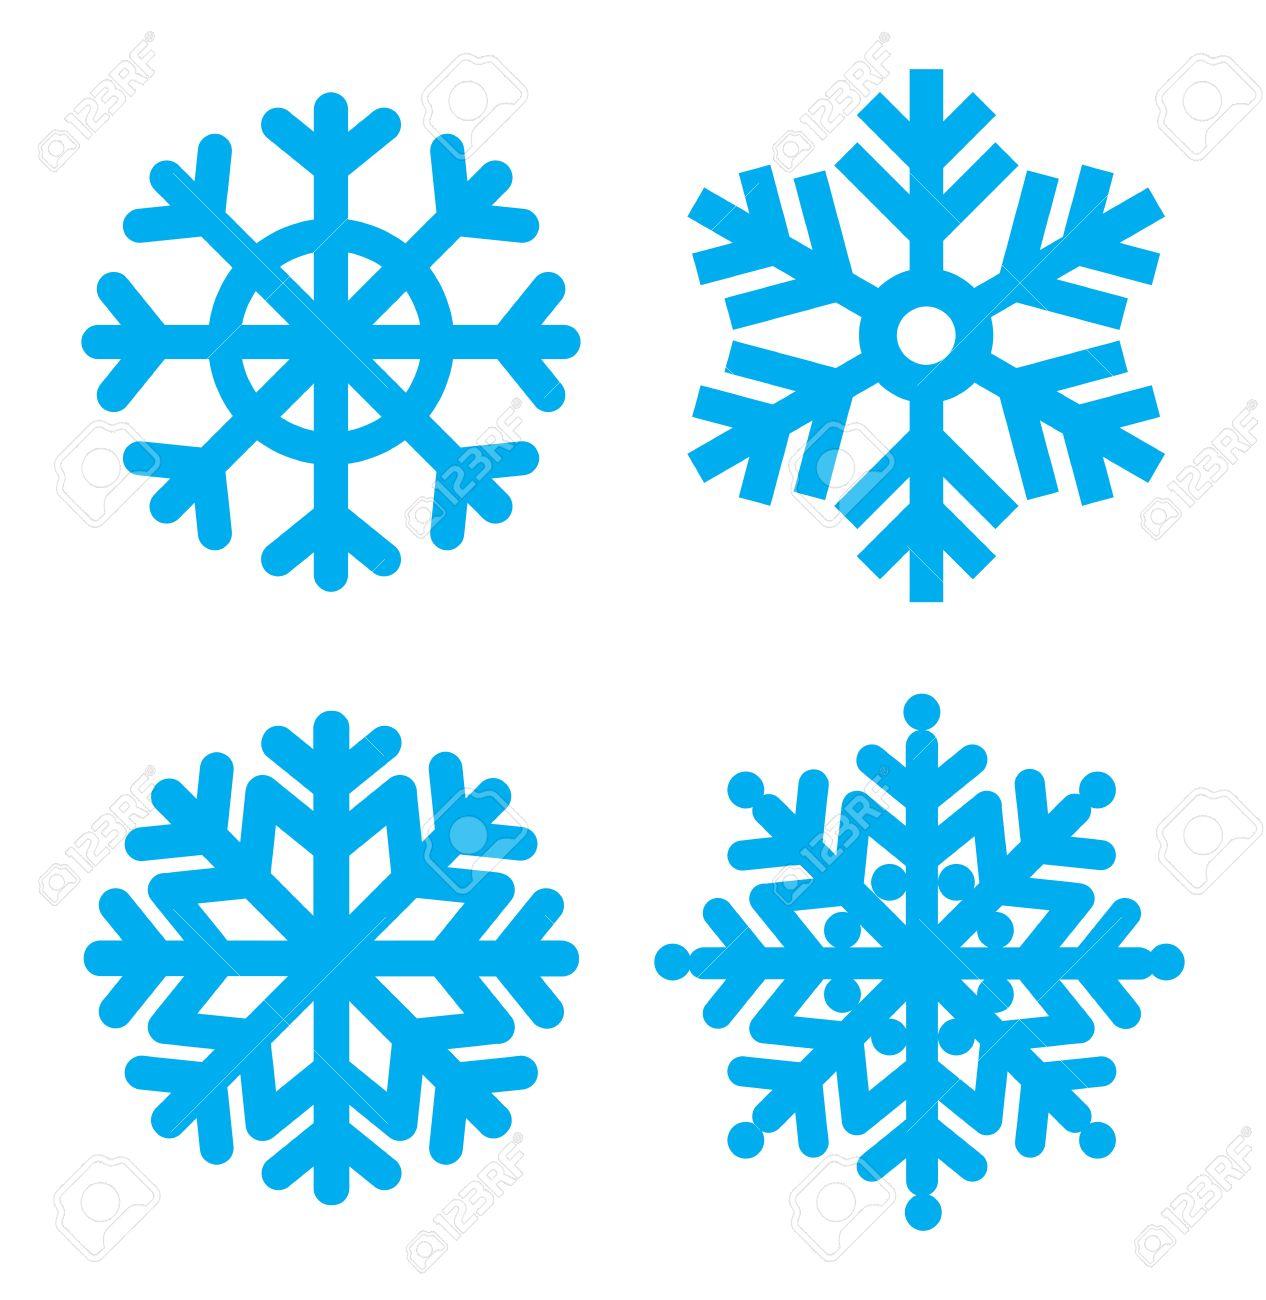 Фото как нарисовать снежинки